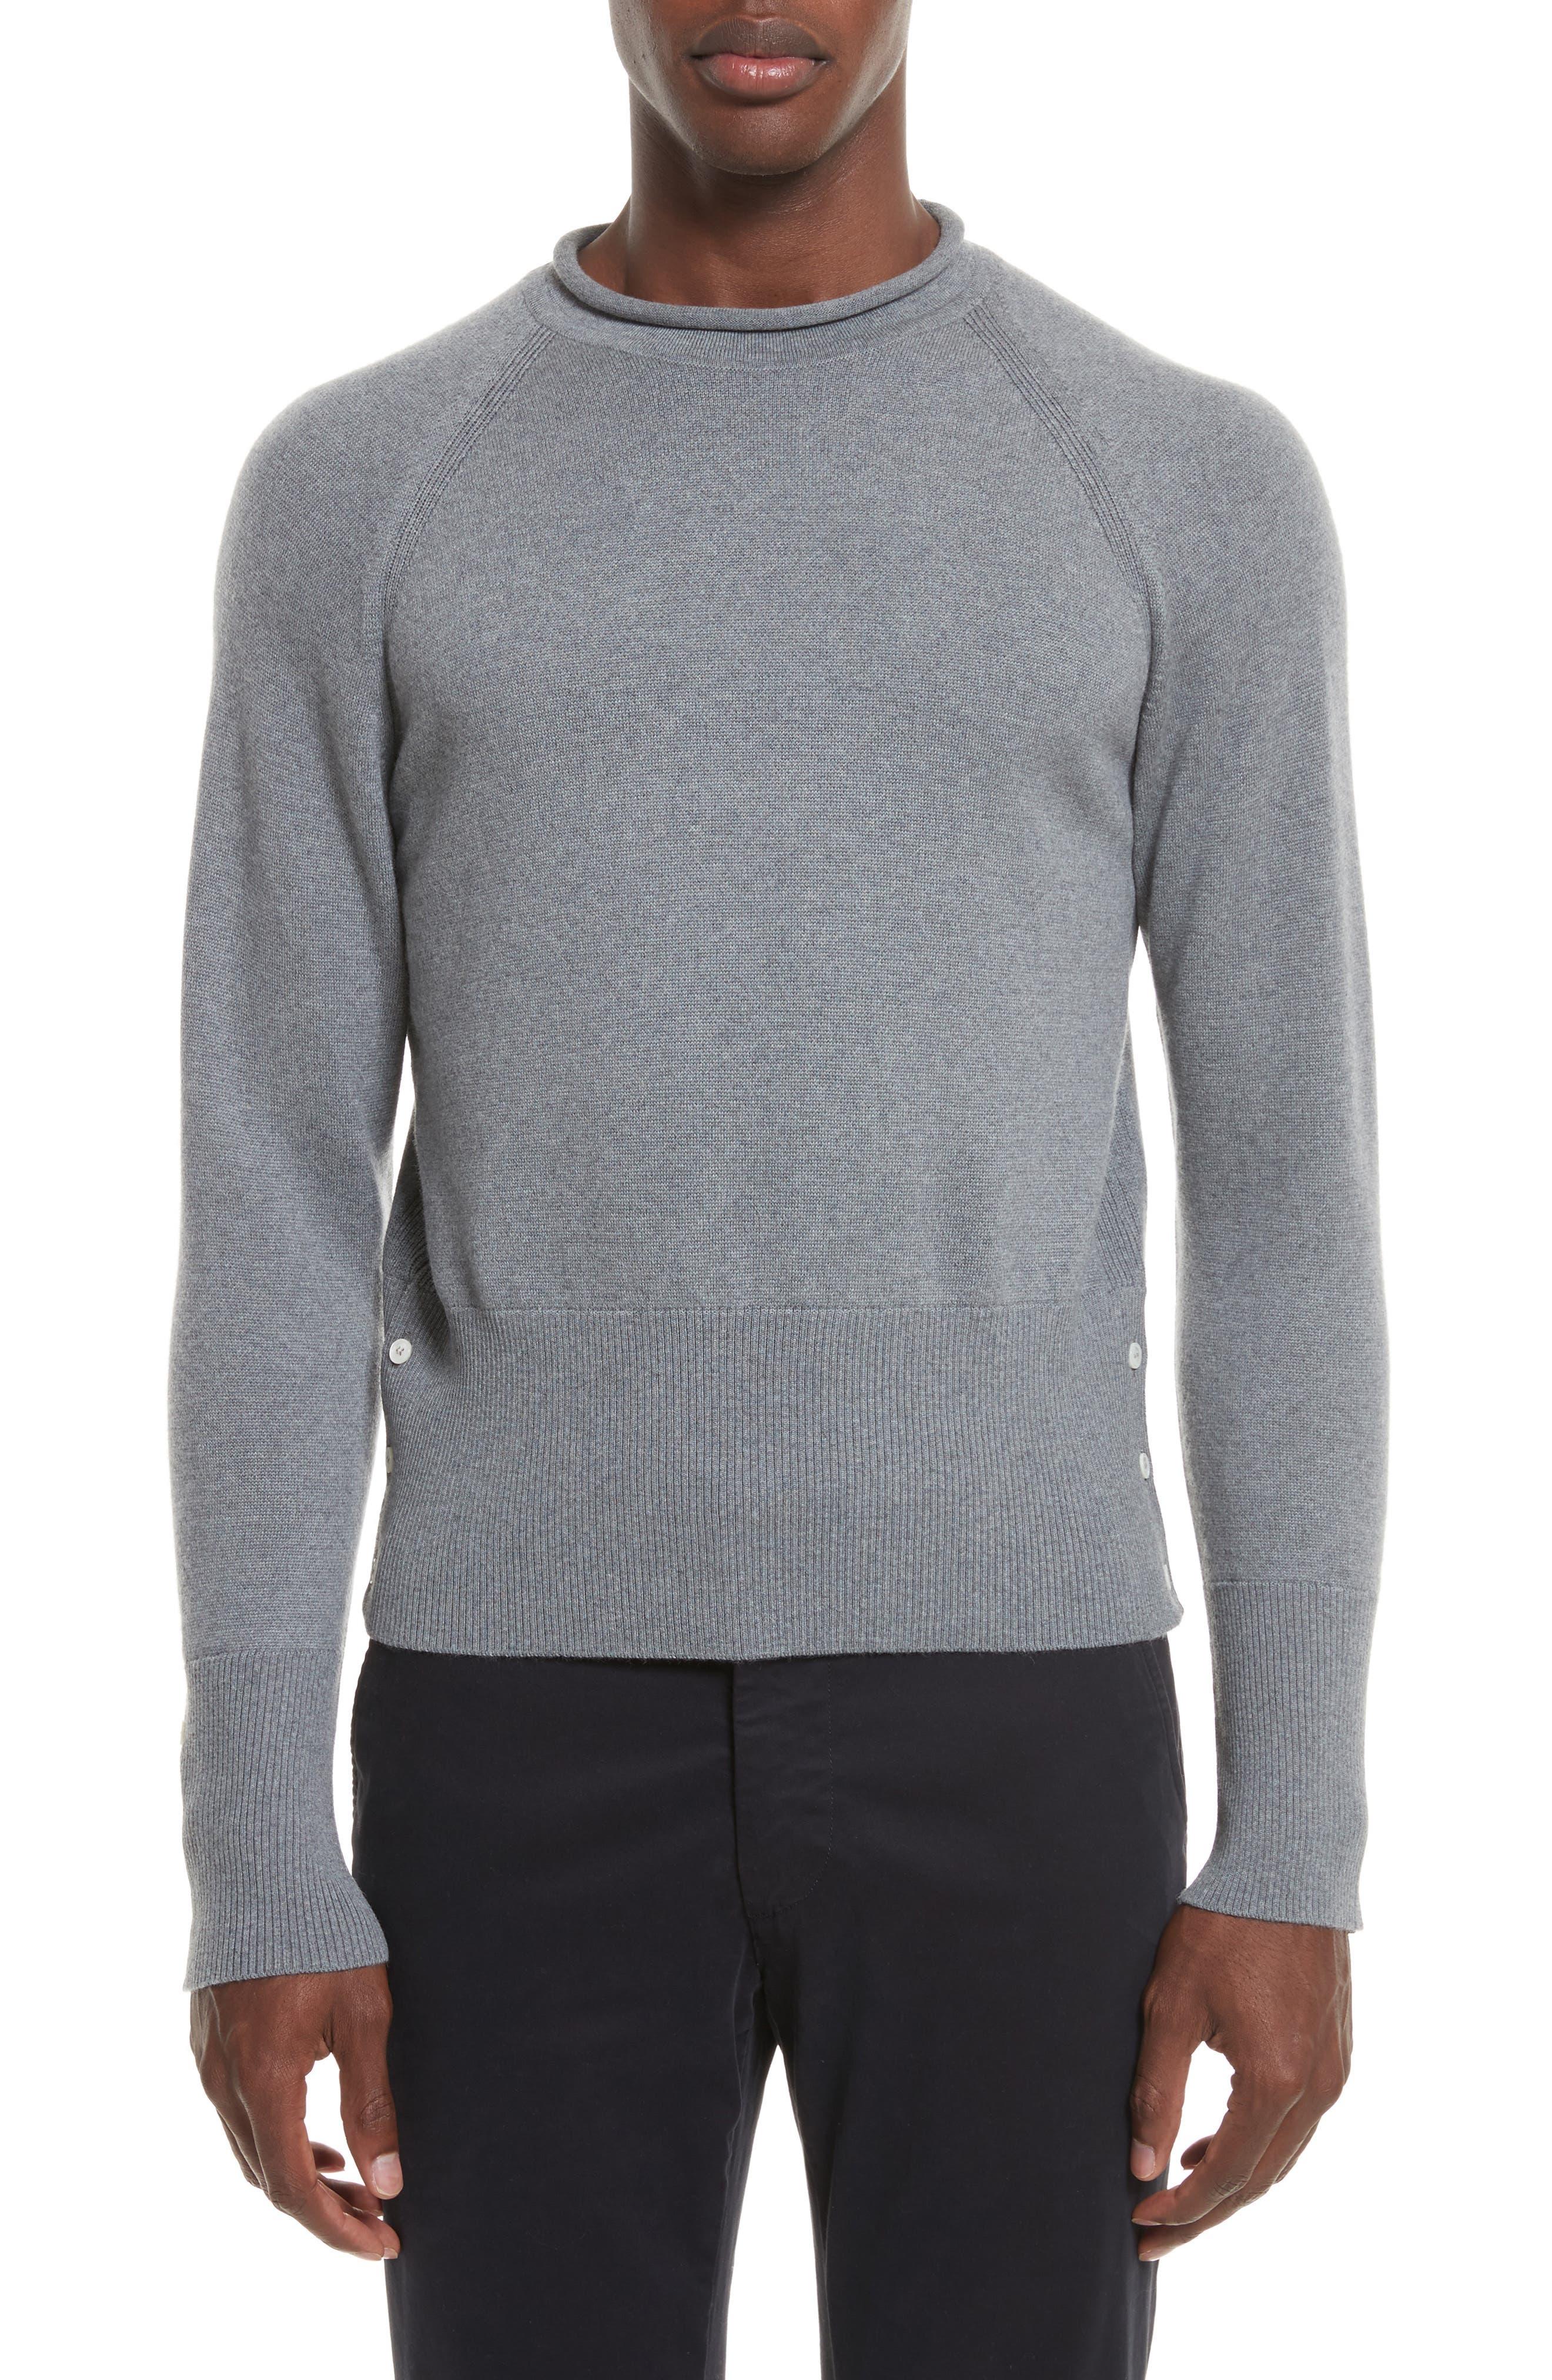 Raglan Merino Wool Sweater,                             Main thumbnail 1, color,                             020